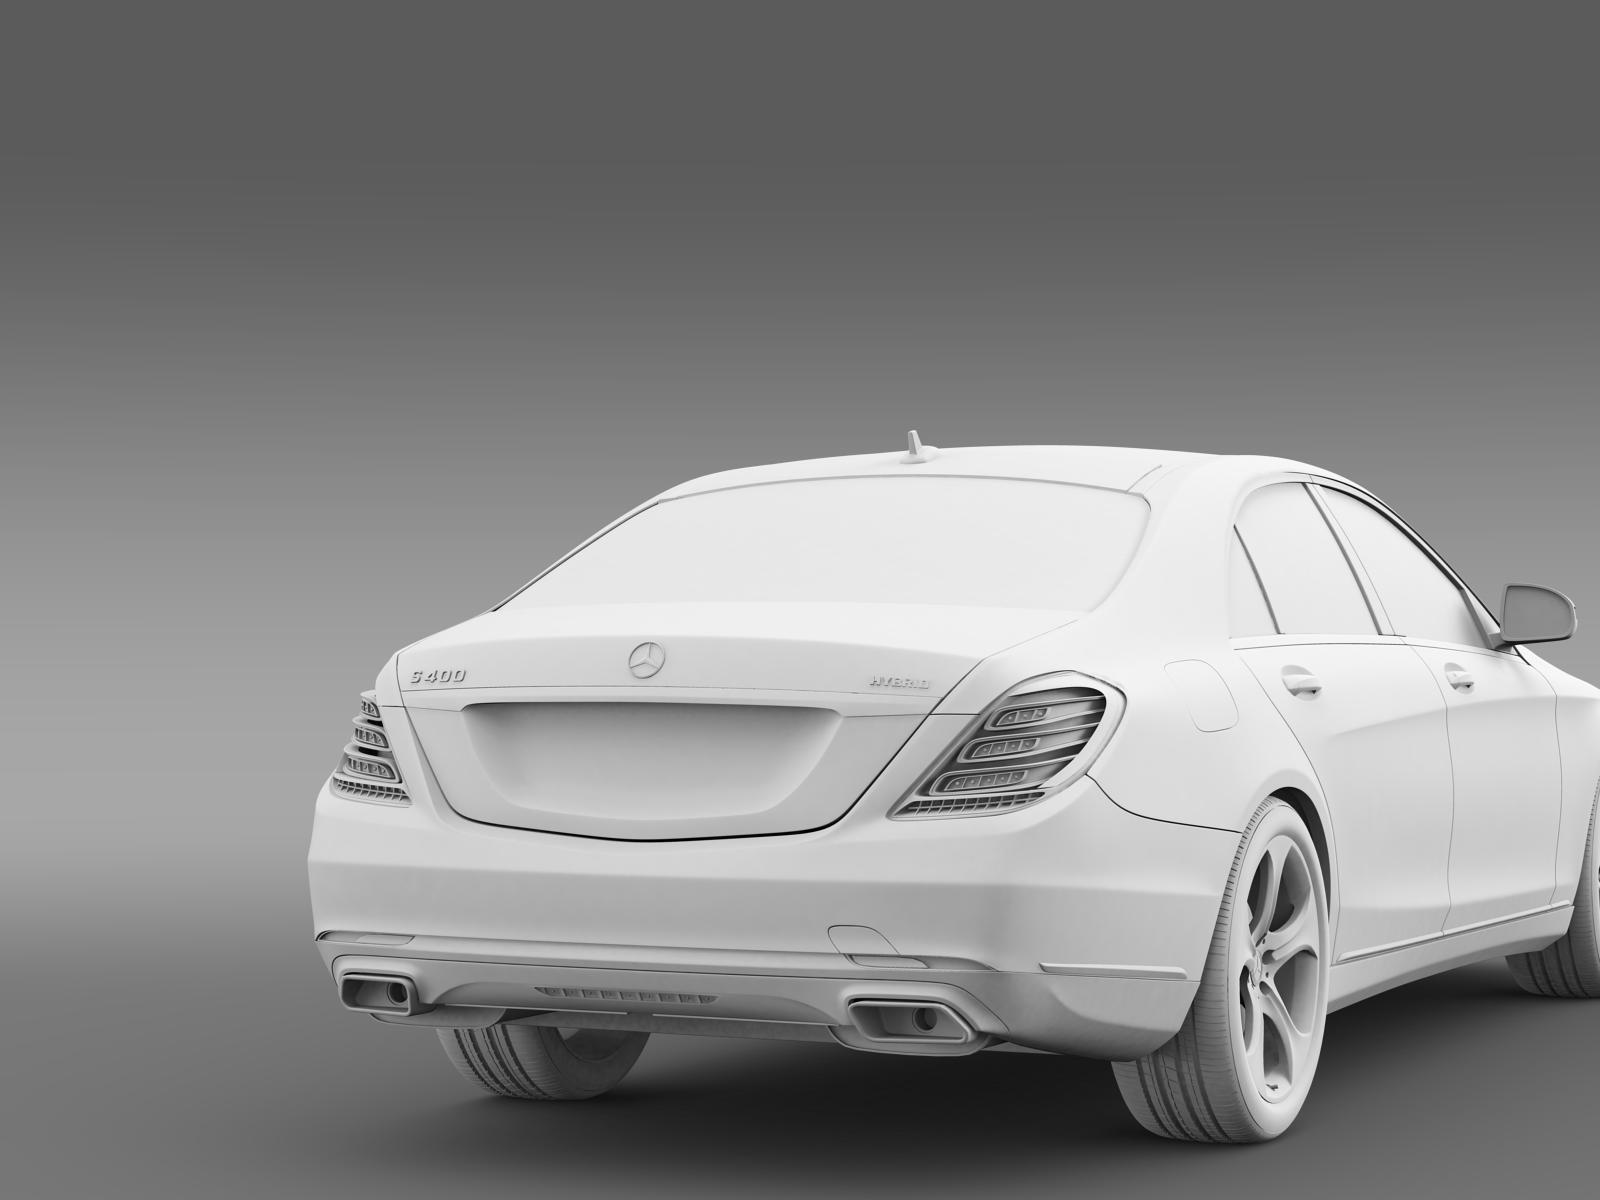 Mercedes benz s 400 hybrid w222 2013 3d model buy for Mercedes benz model s